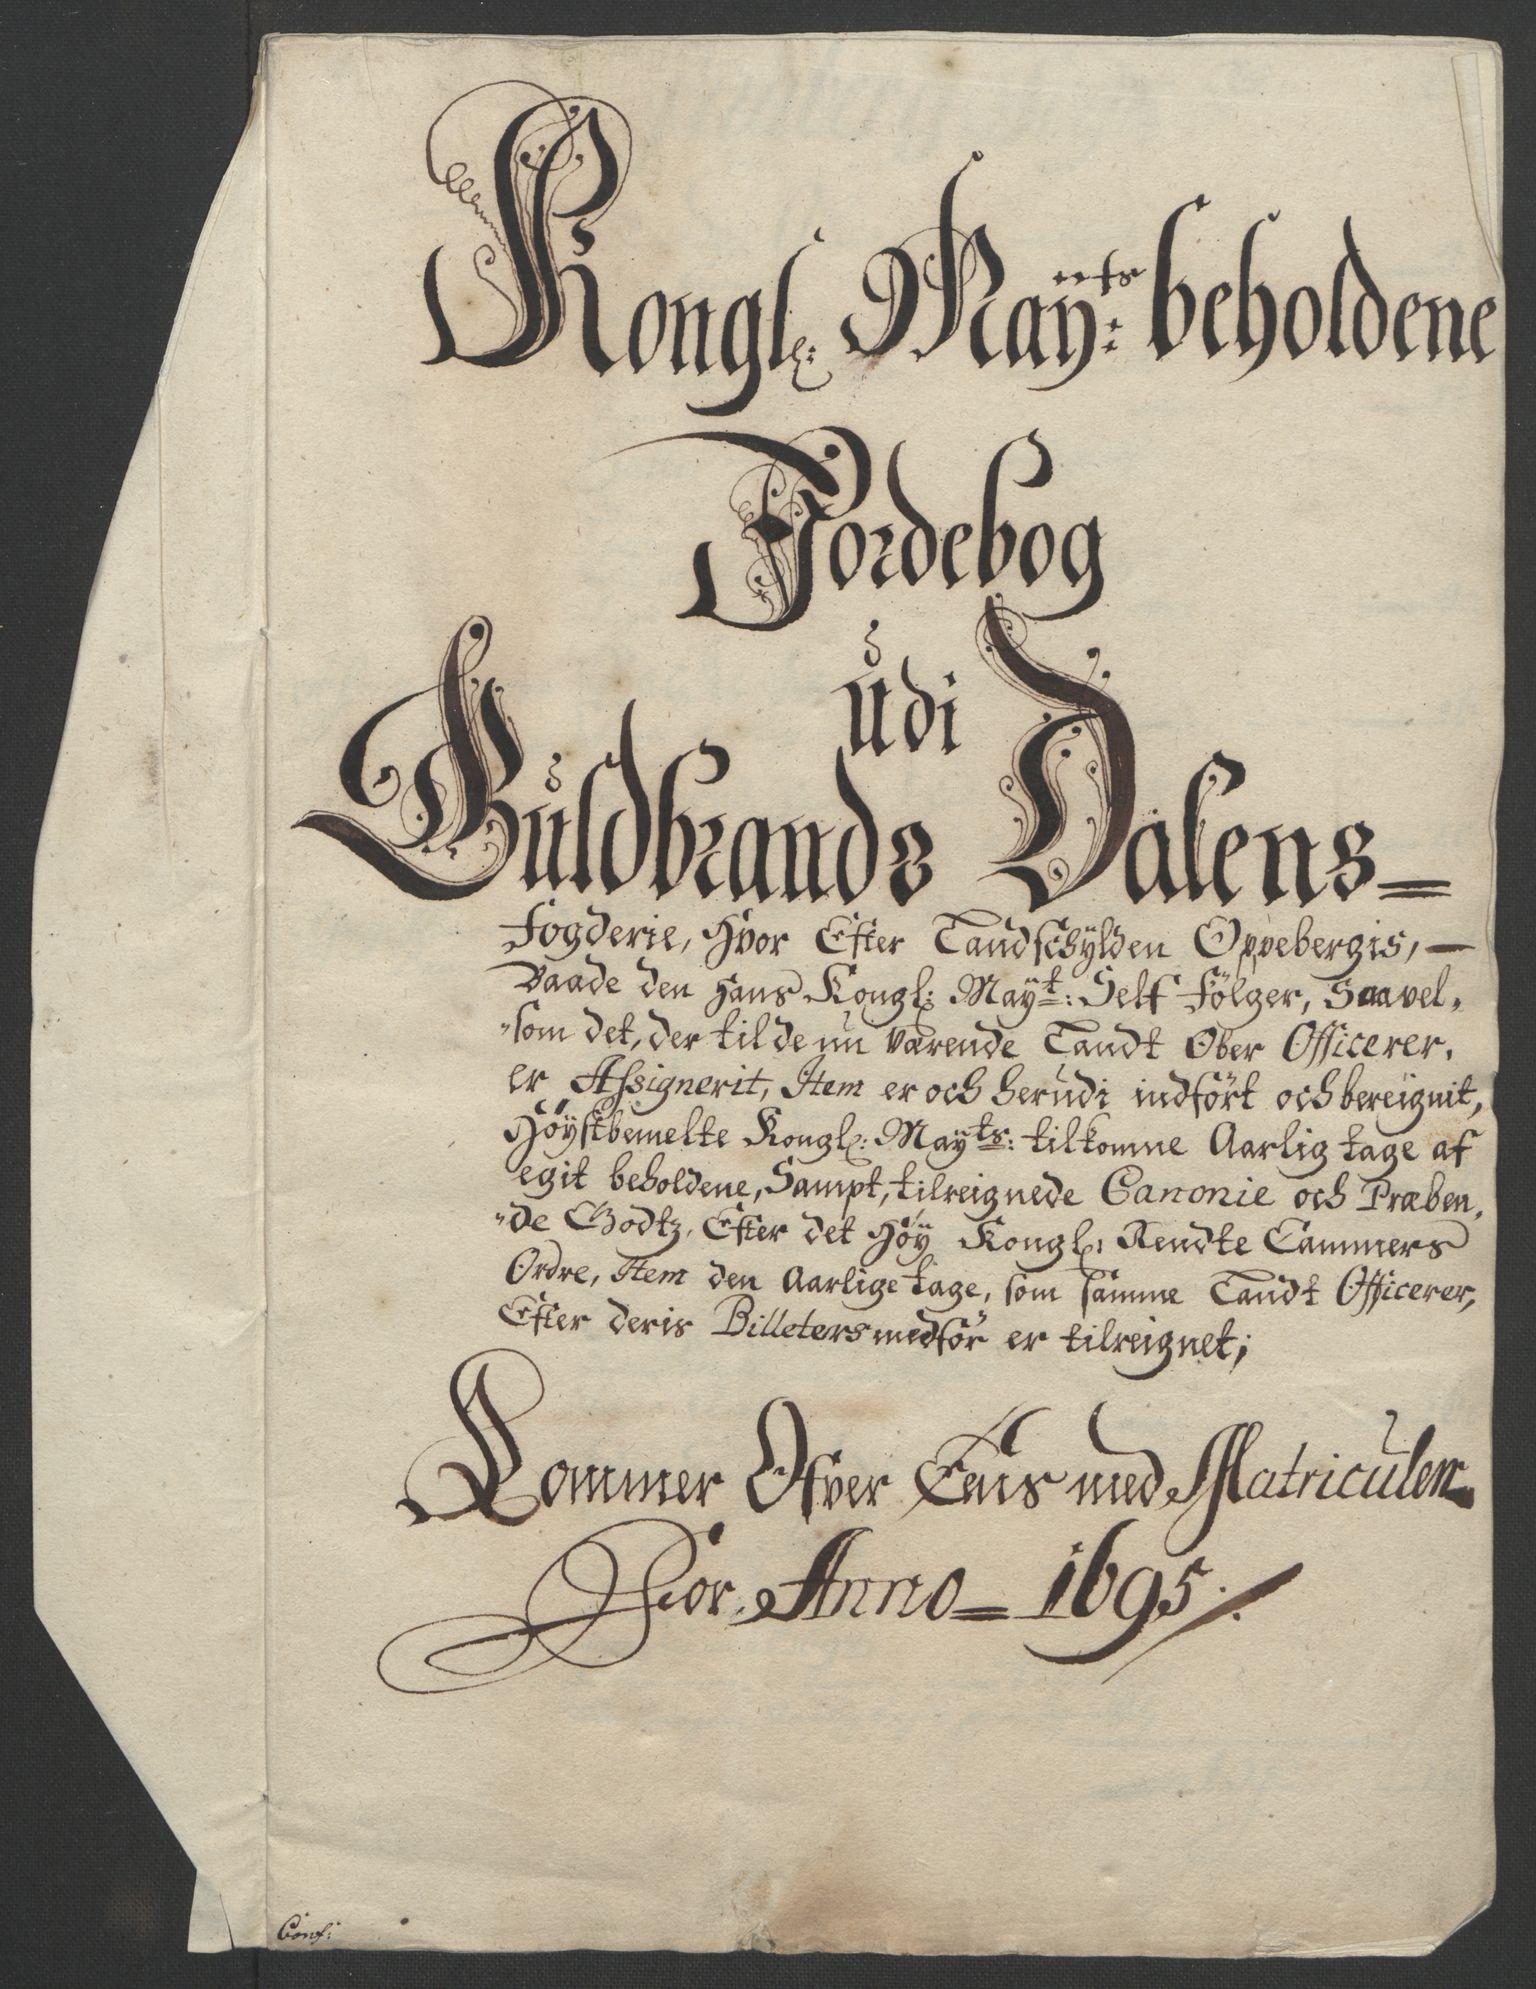 RA, Rentekammeret inntil 1814, Reviderte regnskaper, Fogderegnskap, R17/L1169: Fogderegnskap Gudbrandsdal, 1695, s. 23